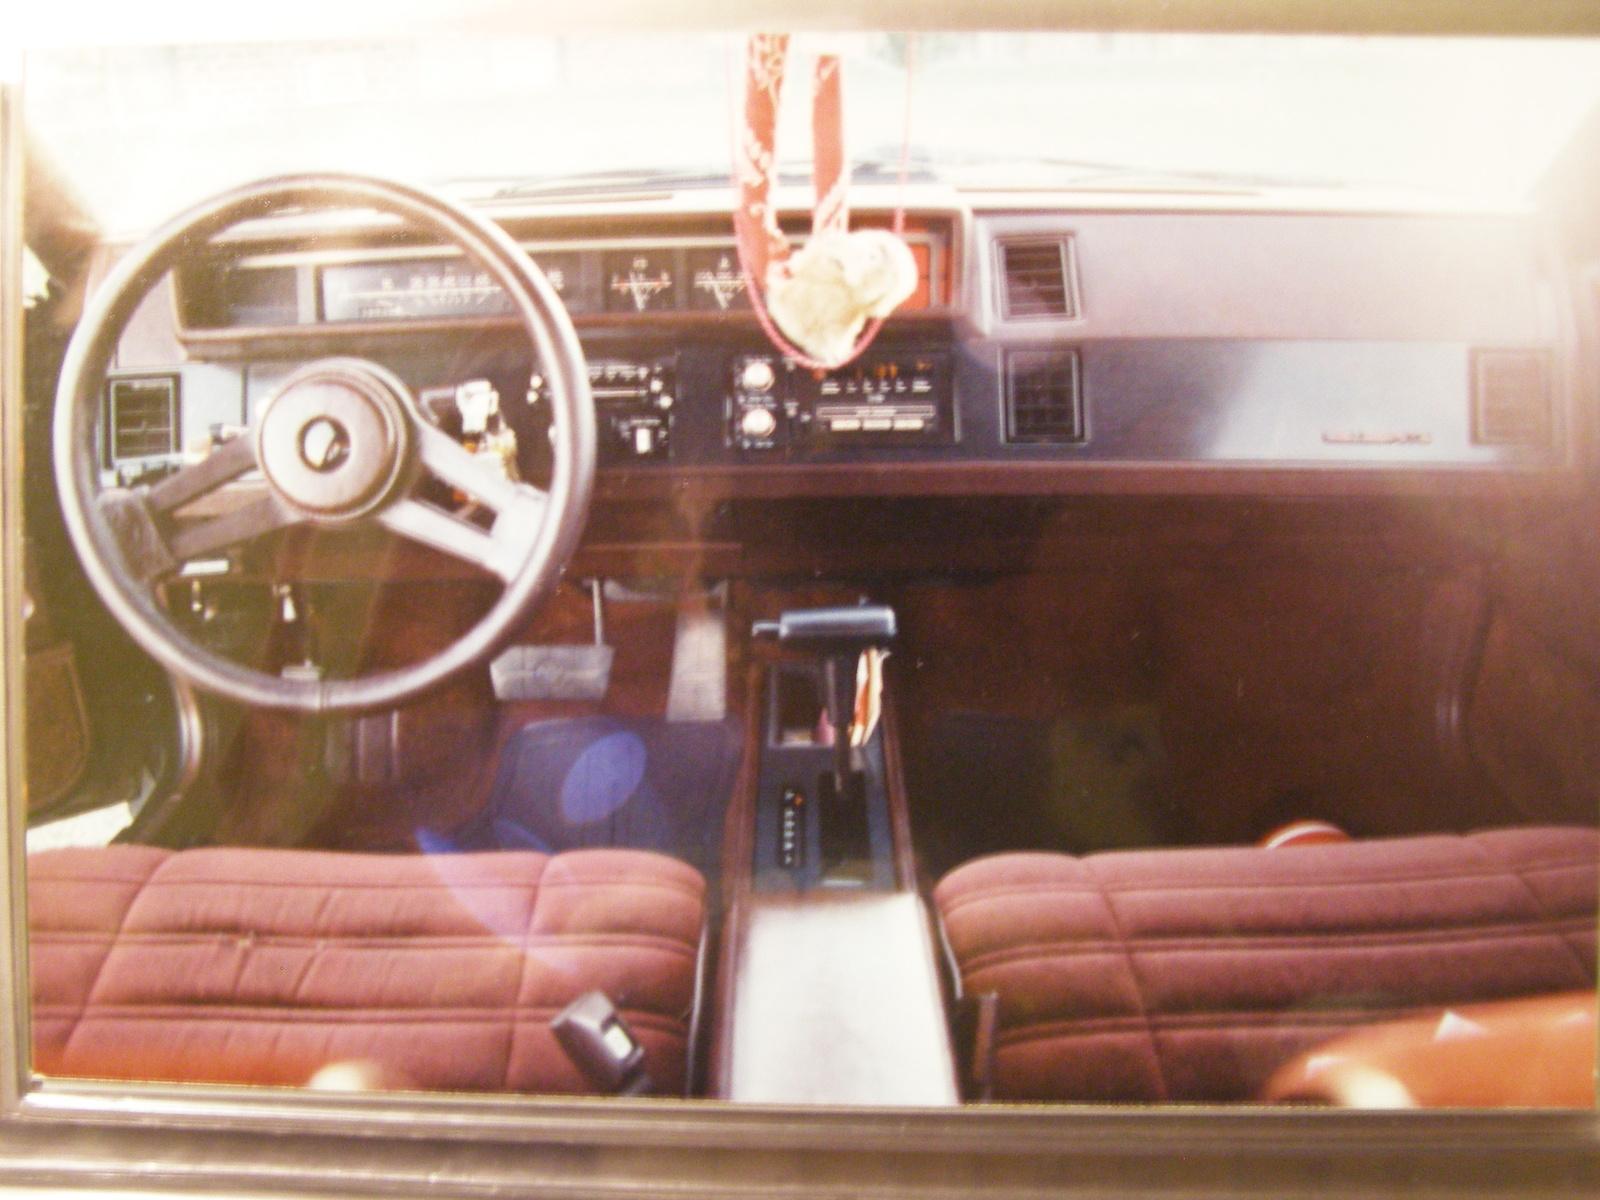 1985 Chevrolet Celebrity Reviews - Carsurvey.org